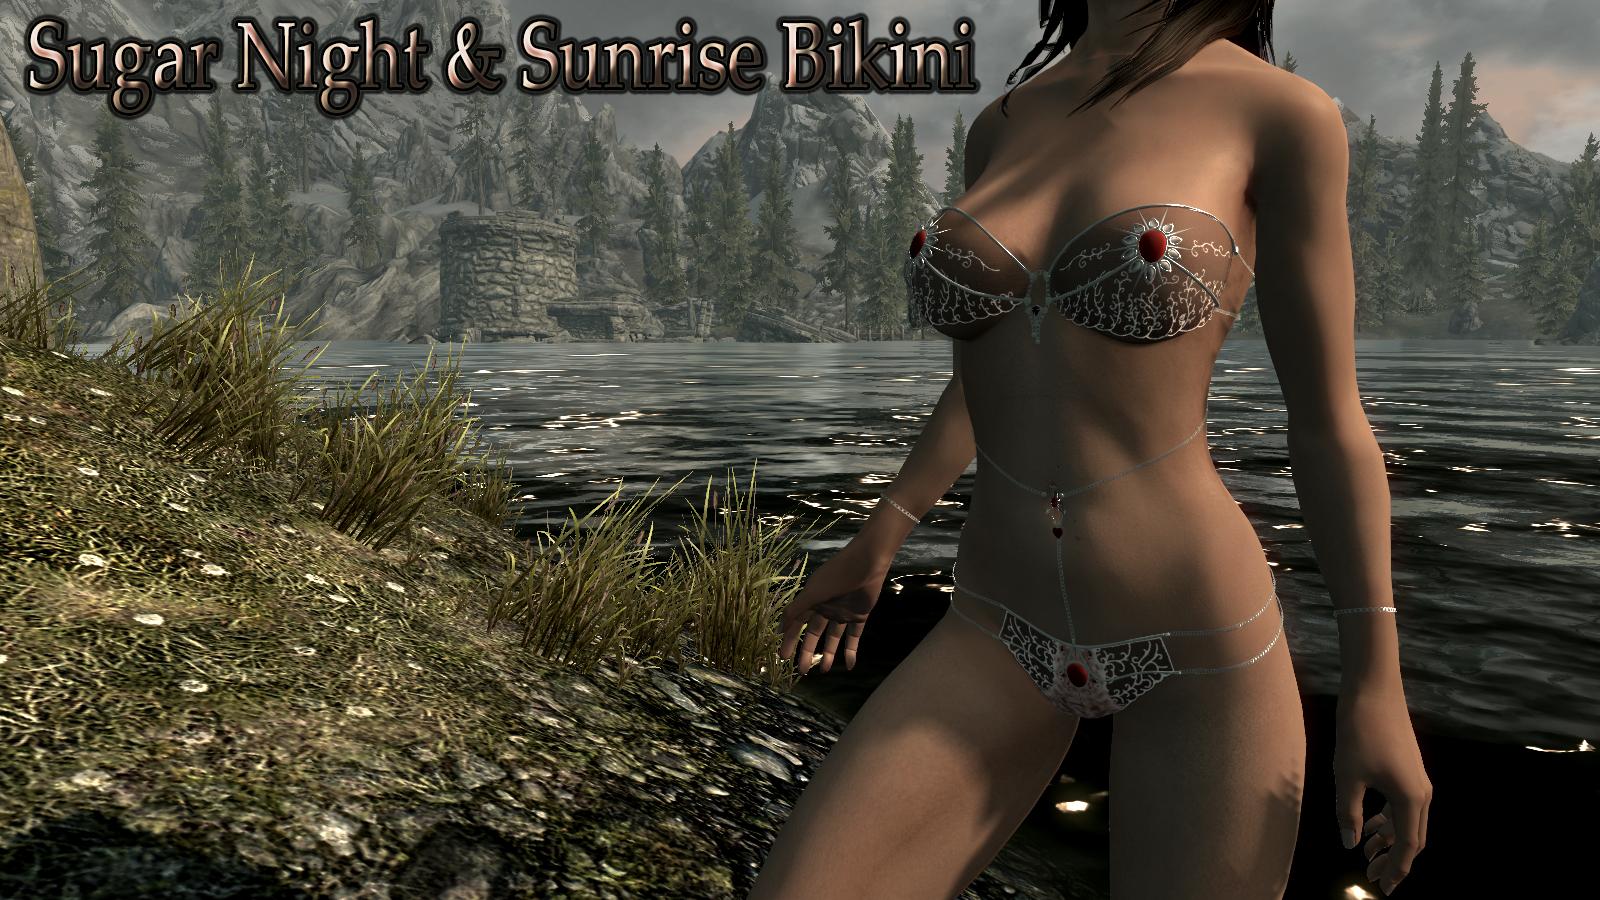 Sugar_Night_and_Sunrise_bikini.jpg